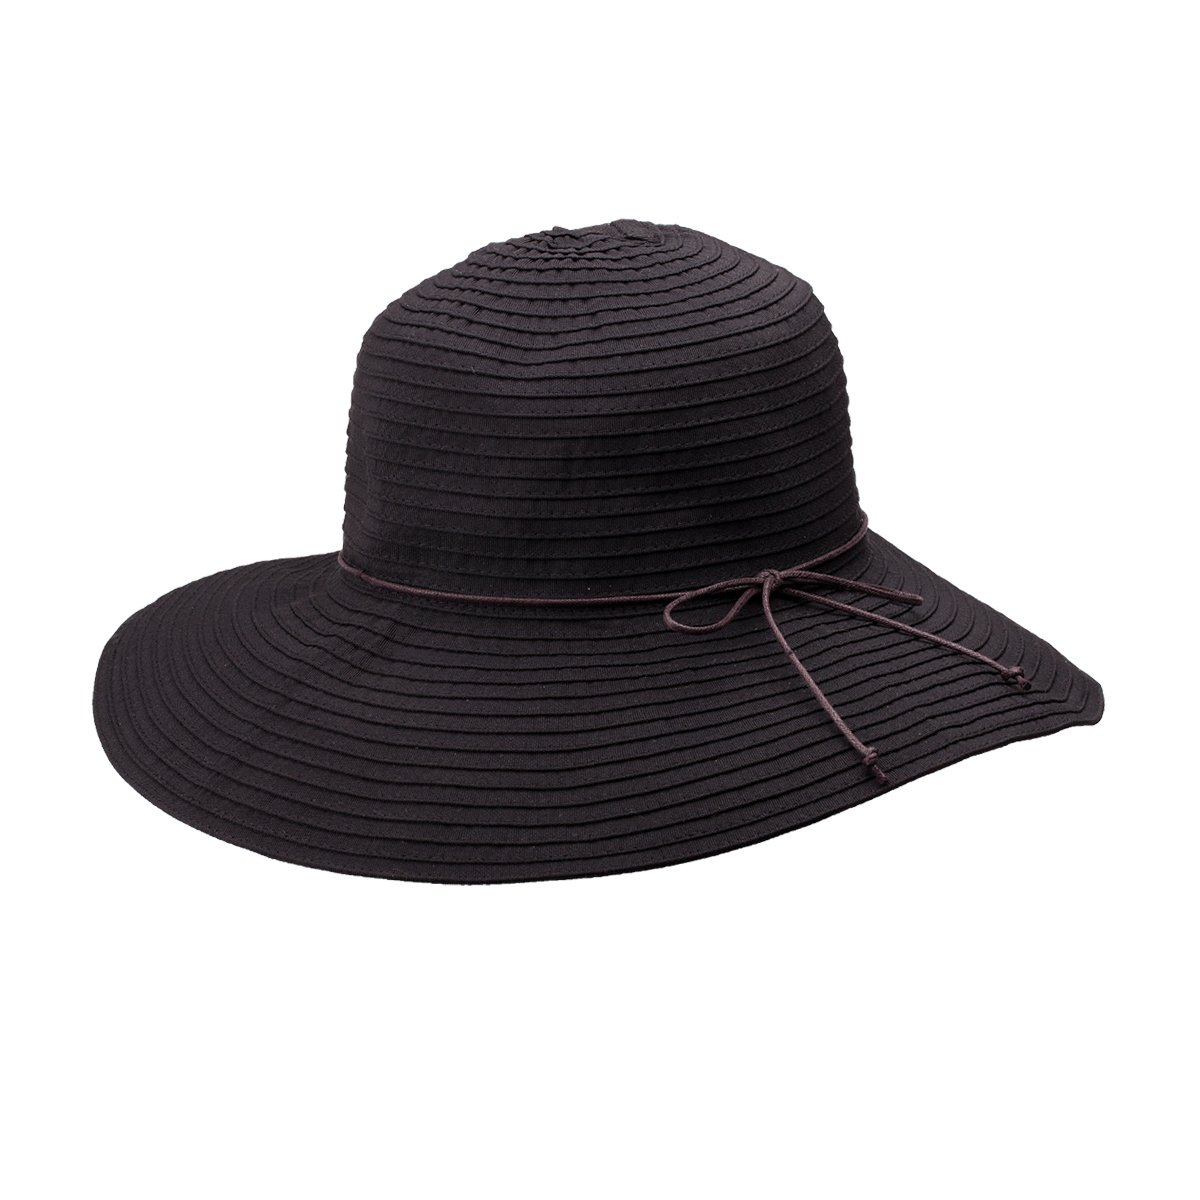 Peter Grimm Womens Glenda Resort Hat - Black